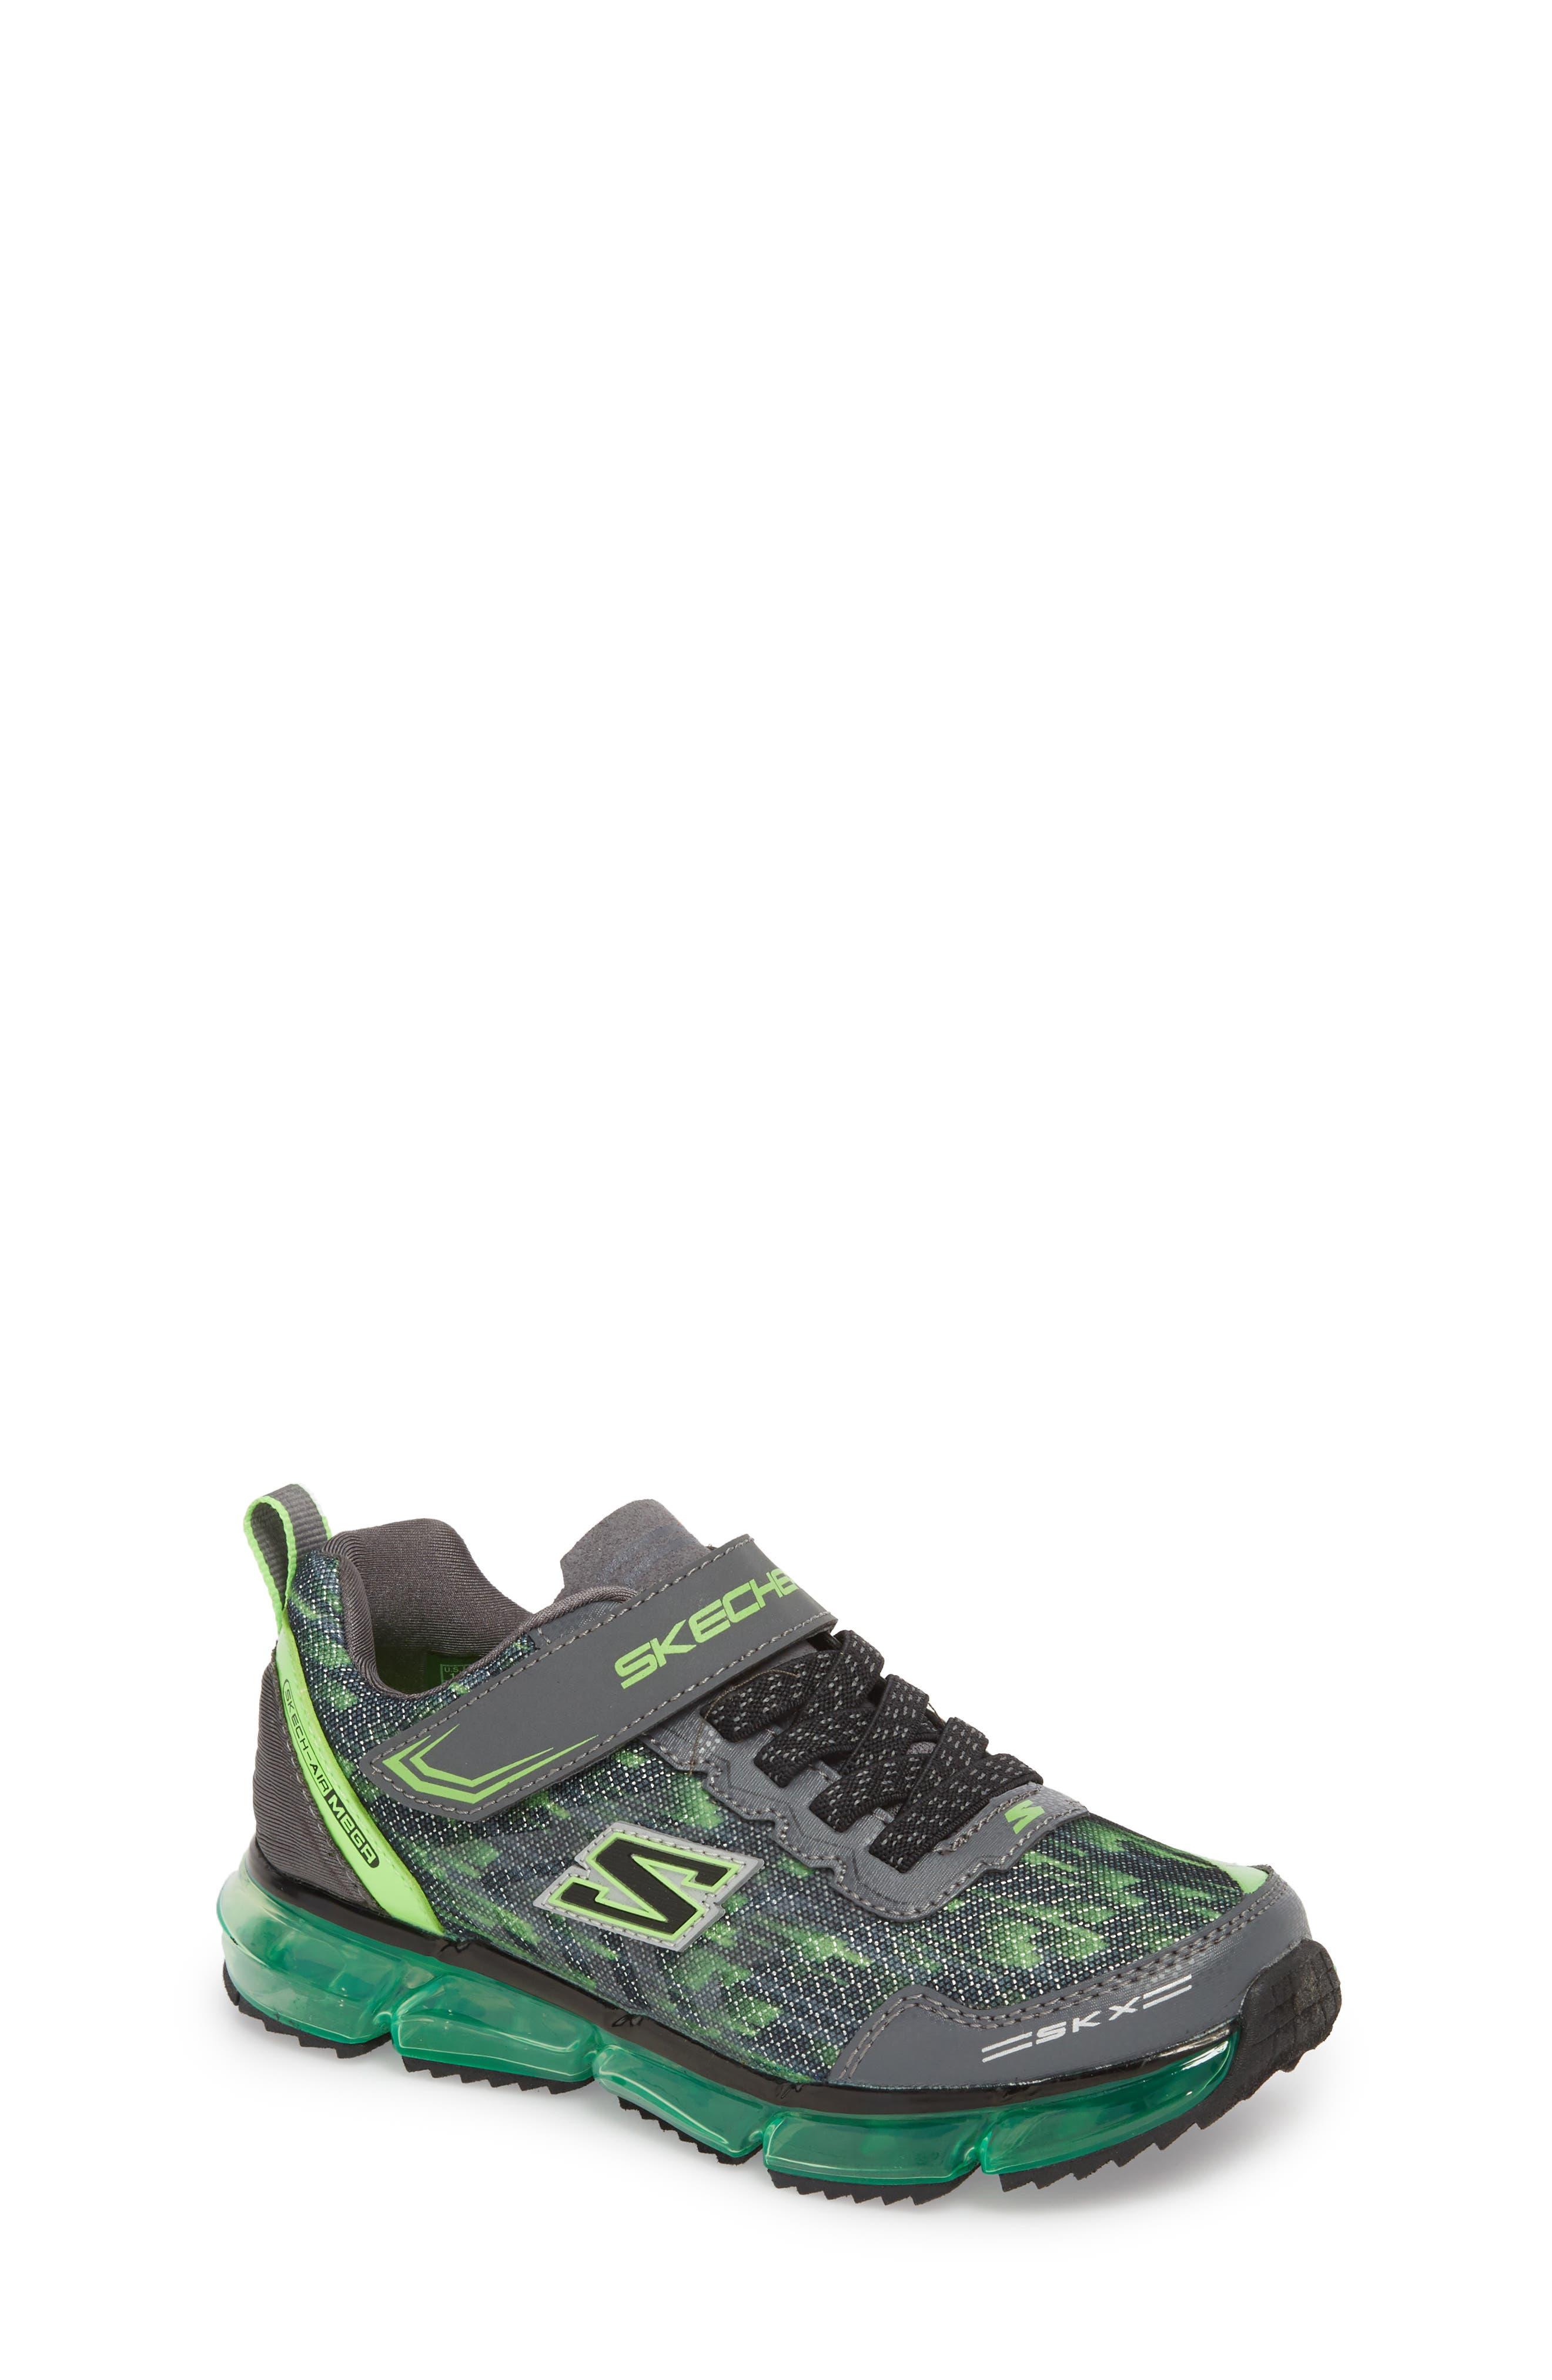 Skech-Air Mega Sneaker,                         Main,                         color, Black/ Charcoal/ Lime